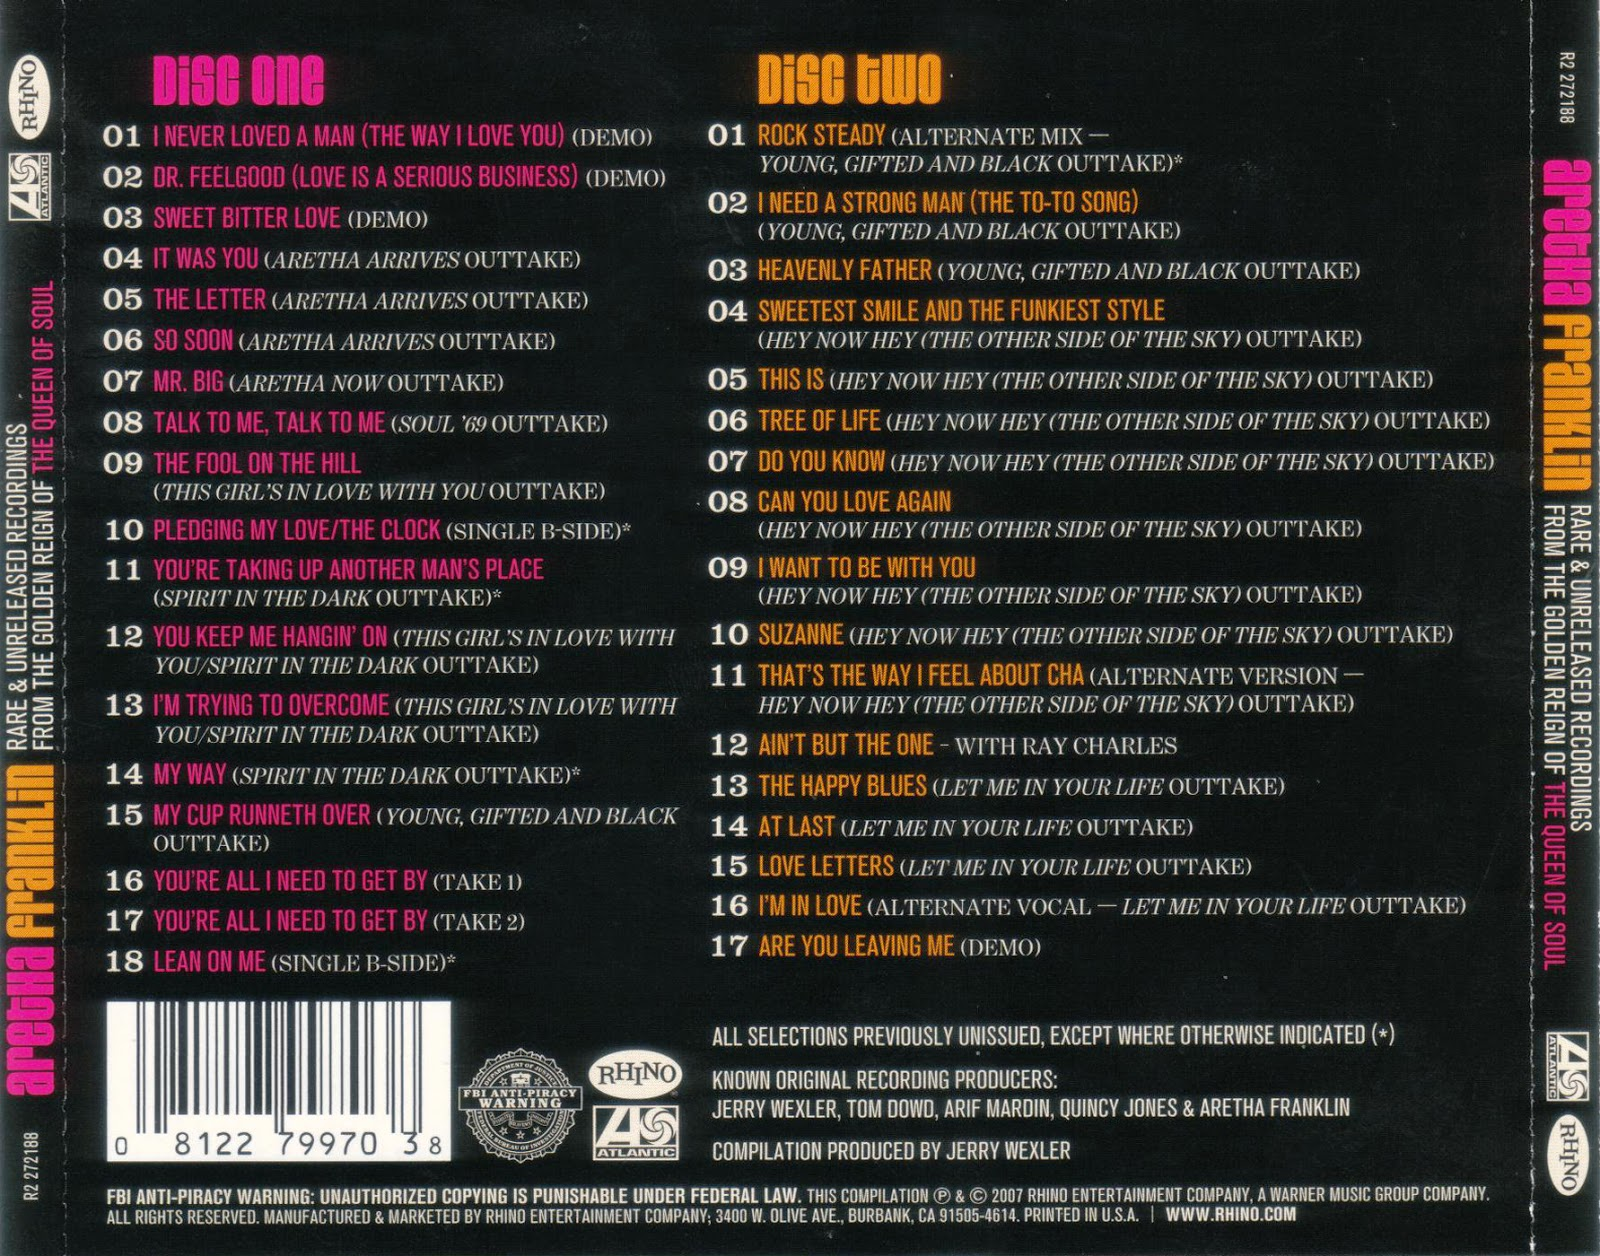 Various Hits Like Dynamite